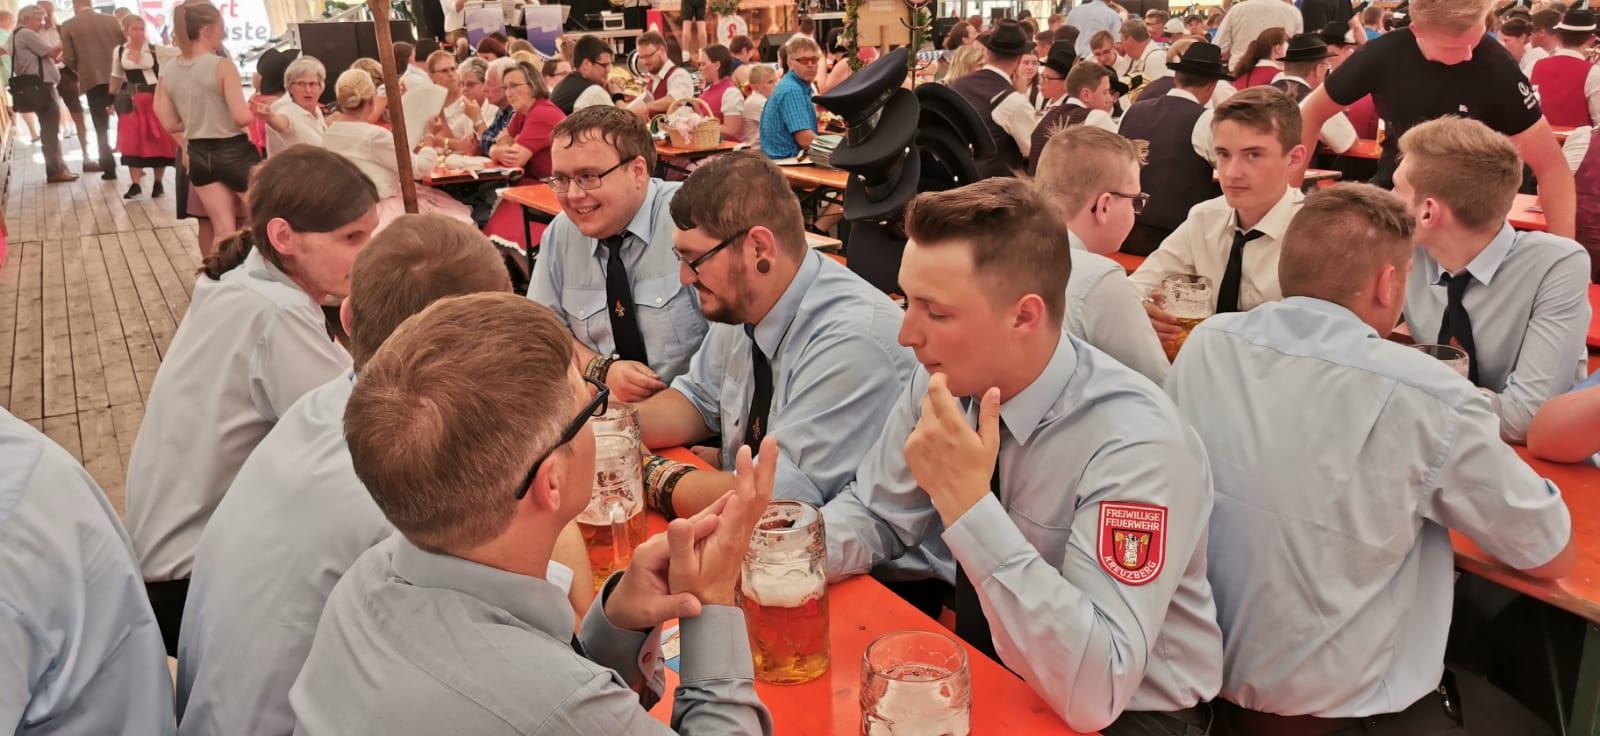 Volksfest 2019 – Im Festzelt